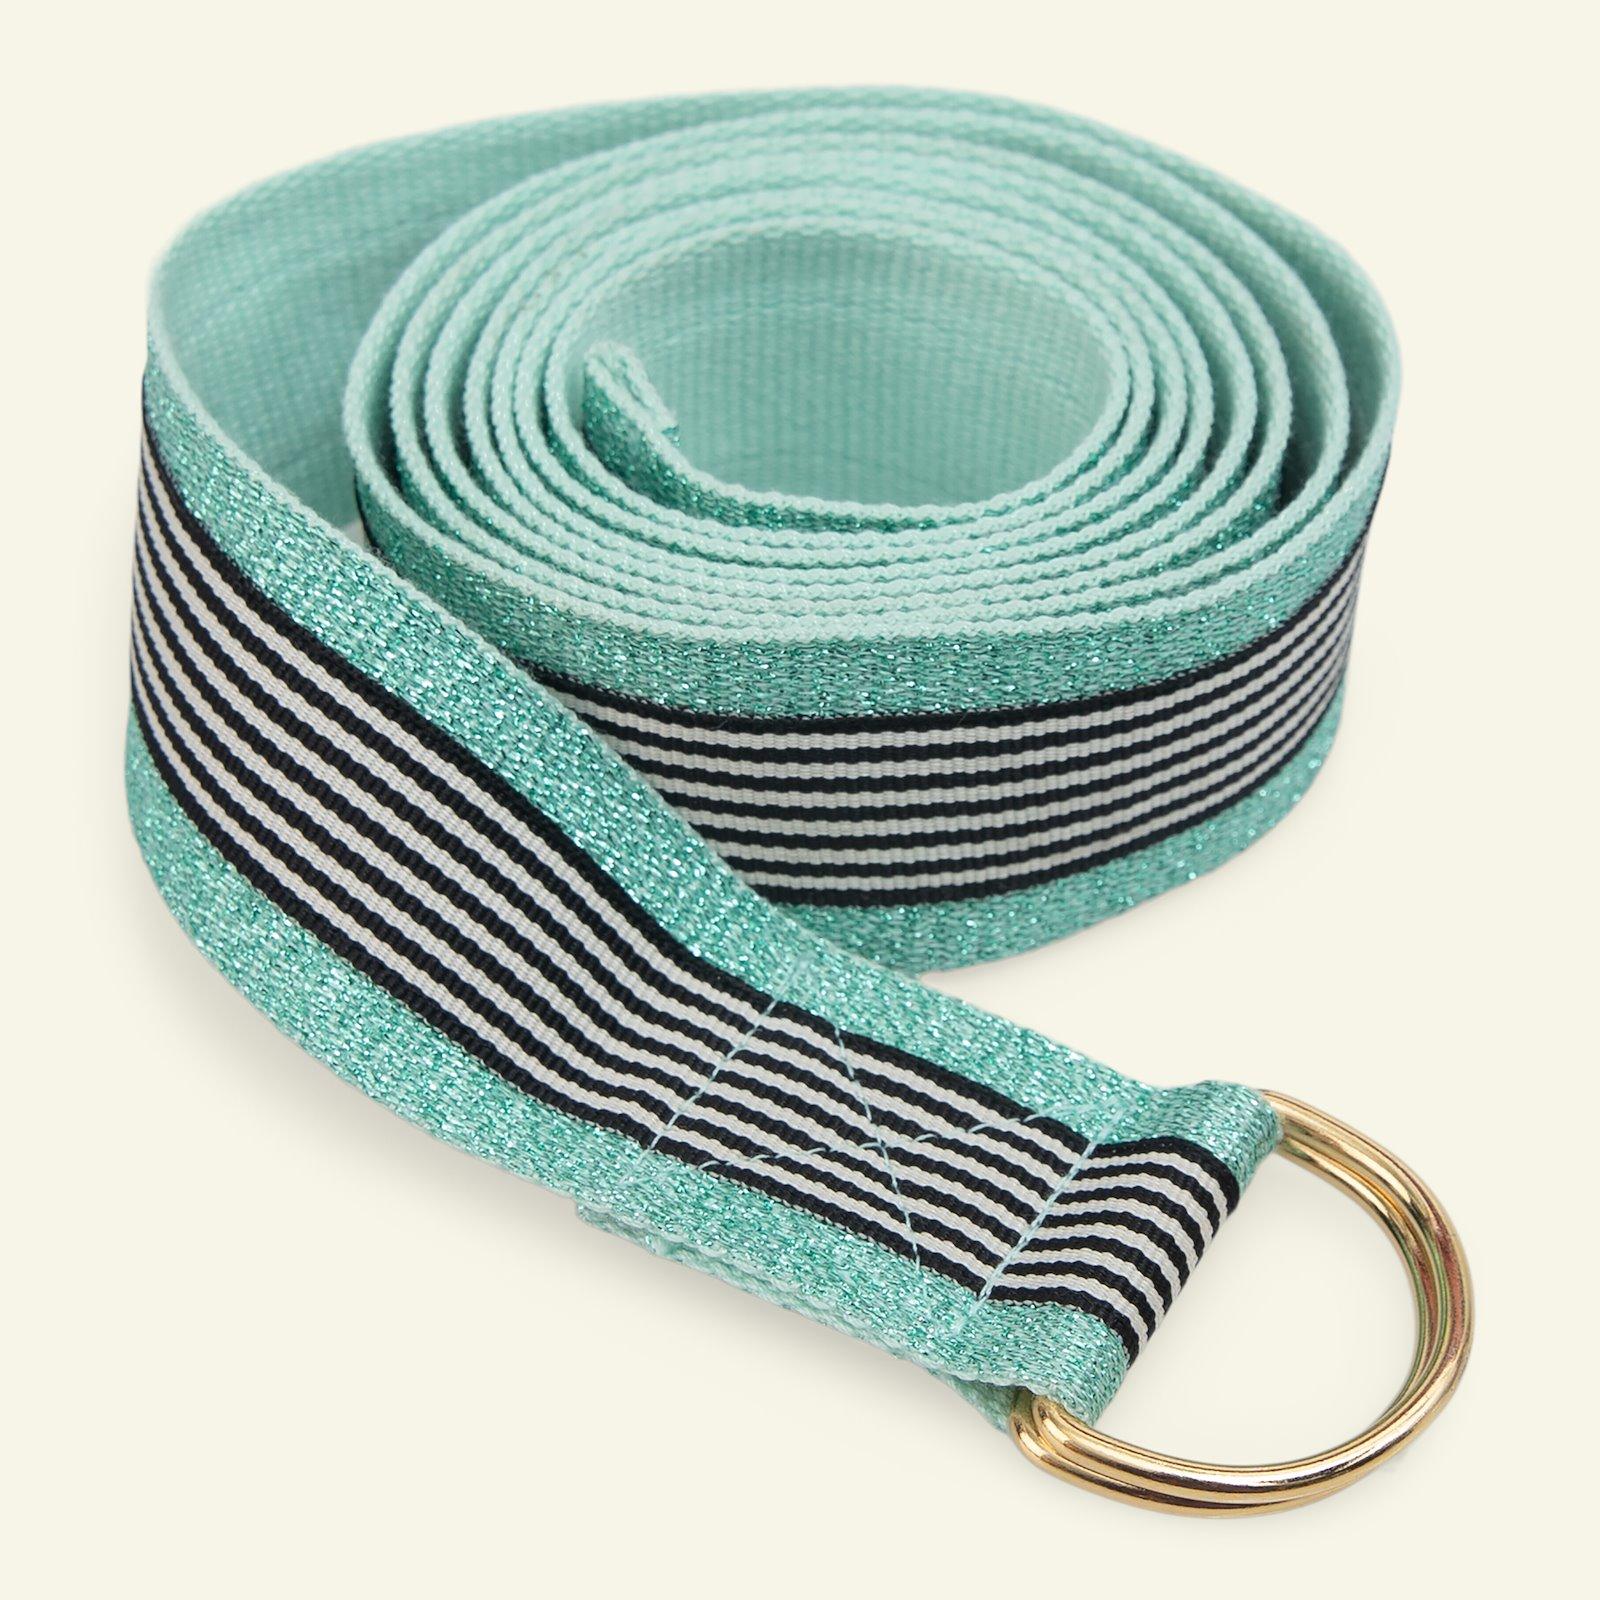 Ribbon woven 20mm black/white 3m p1000000547_21360_21330_45519_sskit